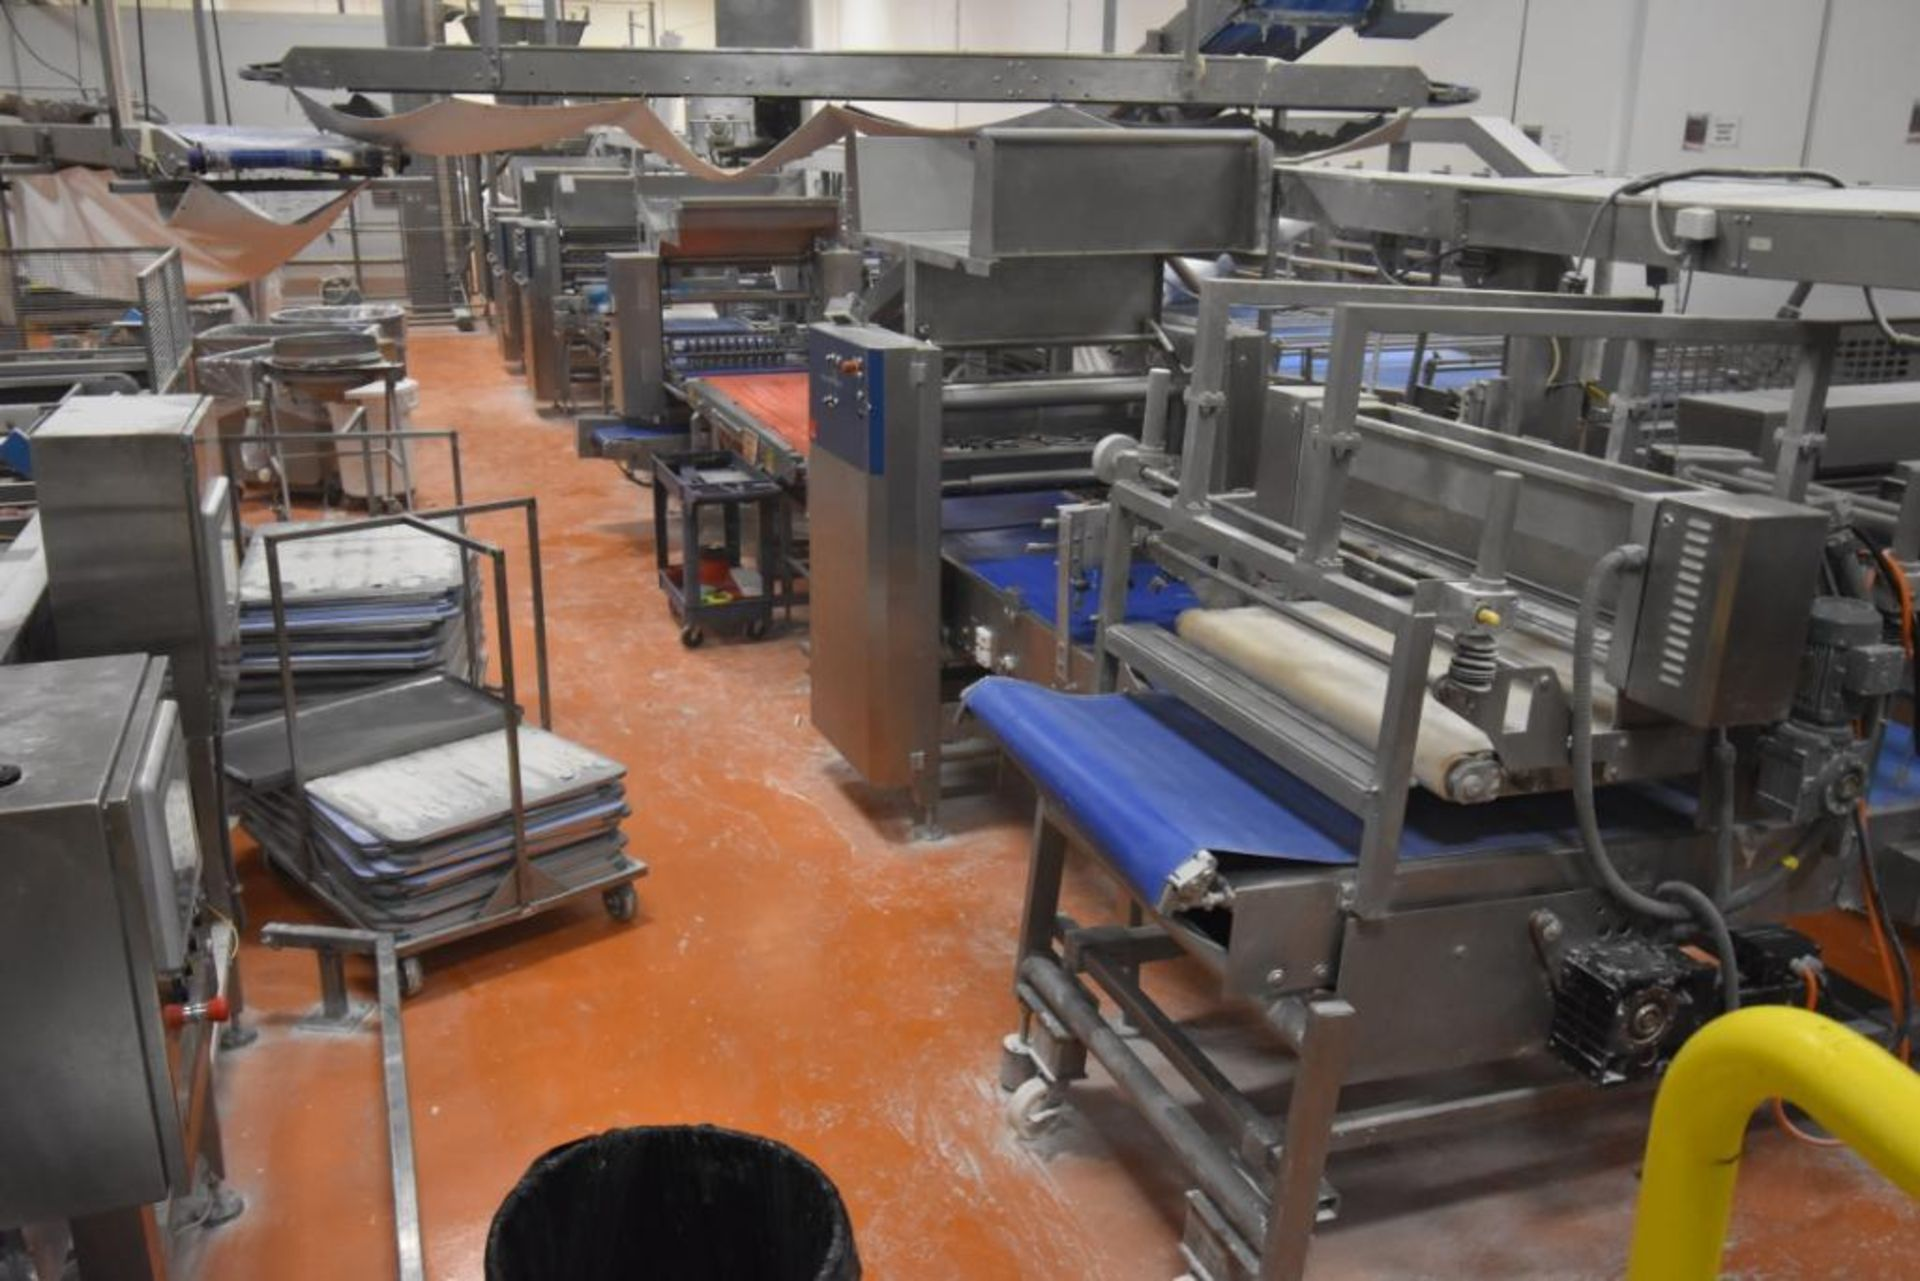 2007 Fritsch Laminator 3000 dough line - Image 179 of 280